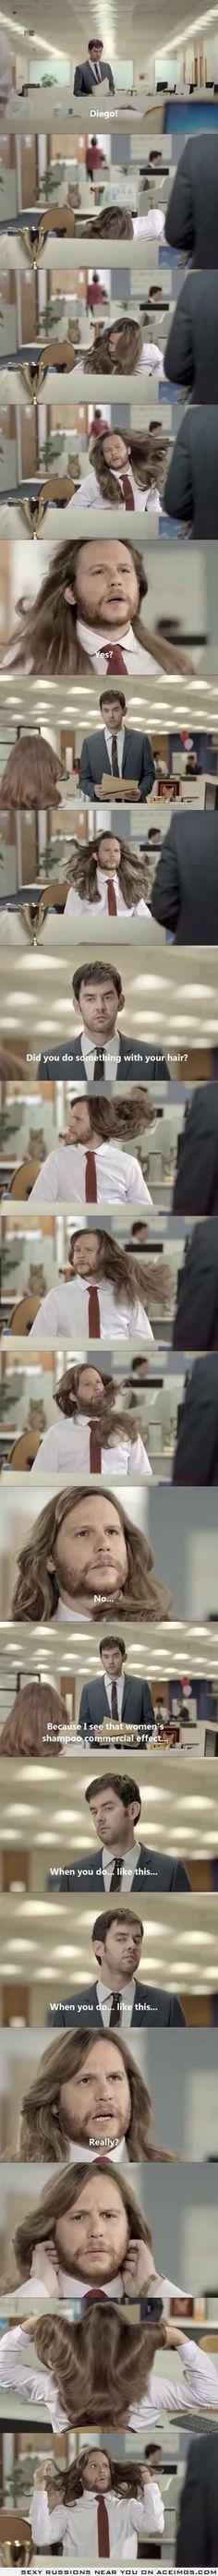 What happens when MEN use woMEN shampoo